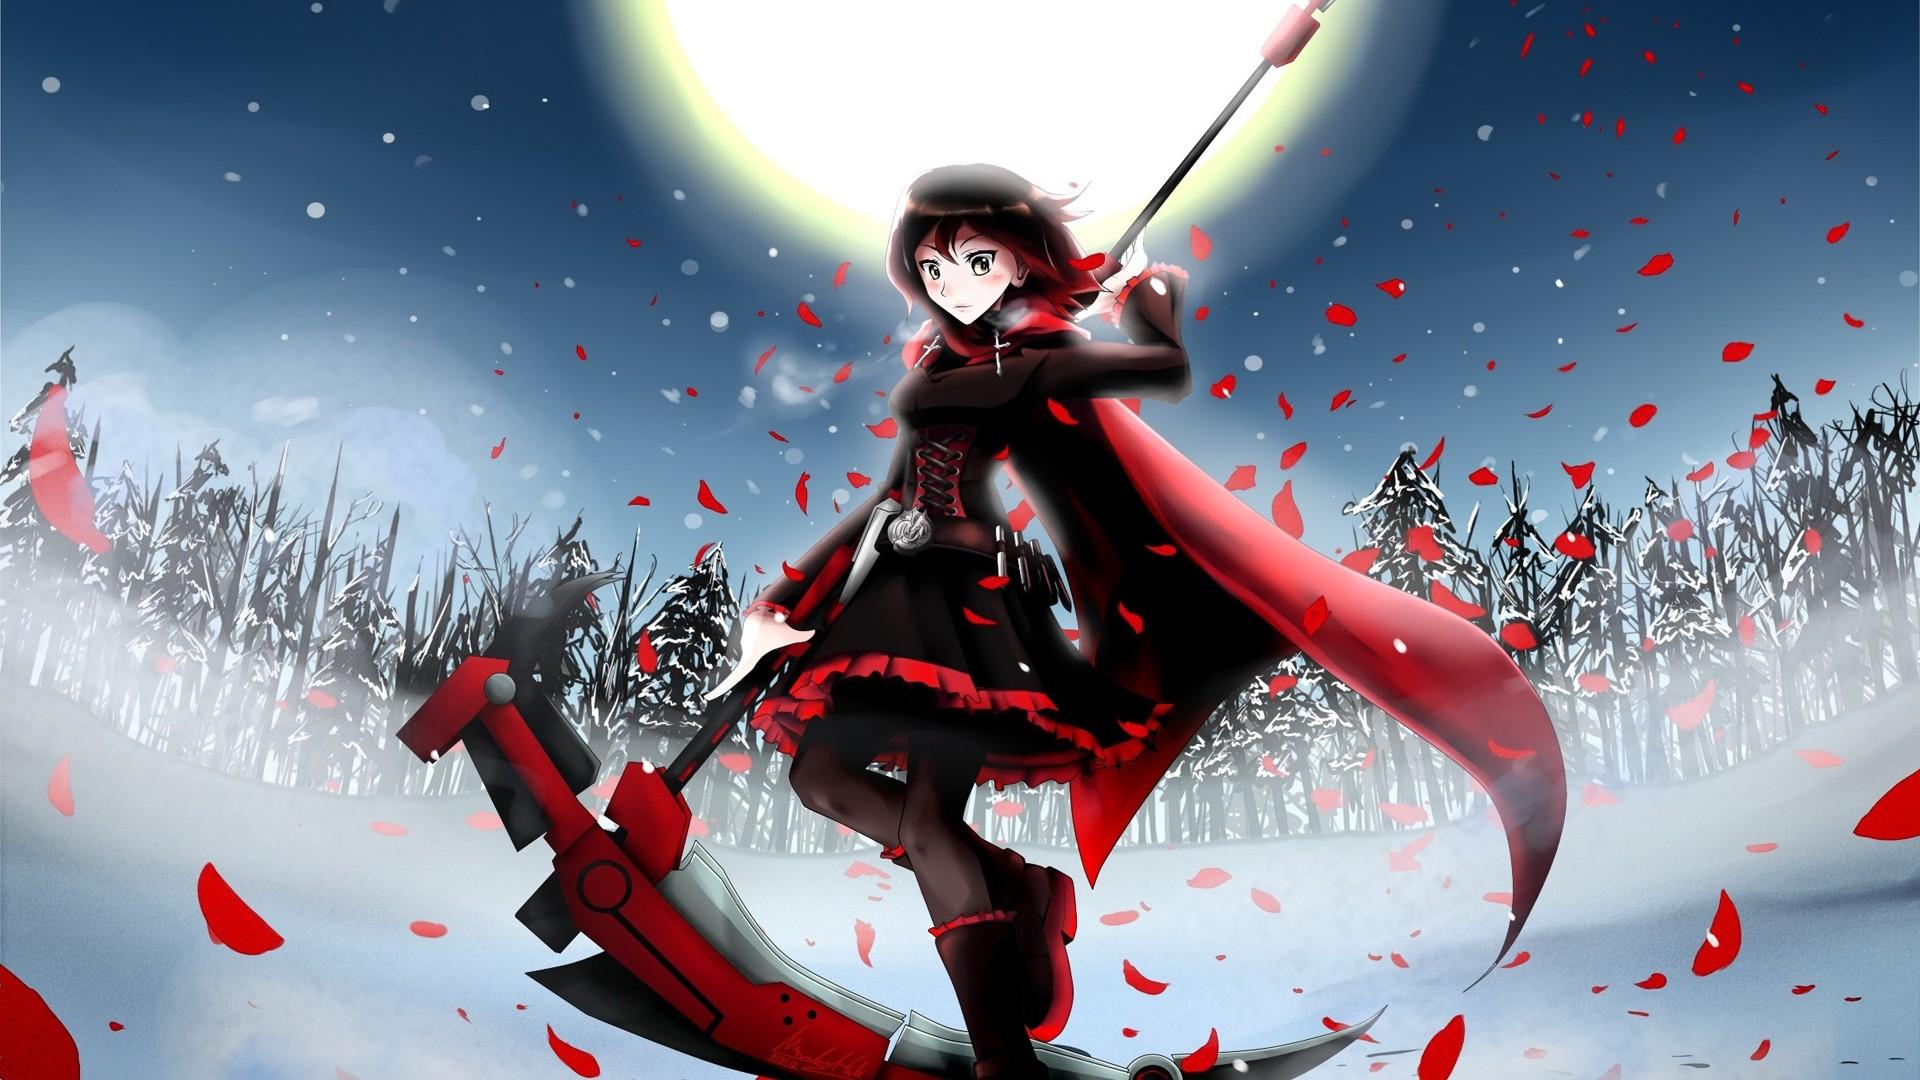 10. cool anime wallpapers10